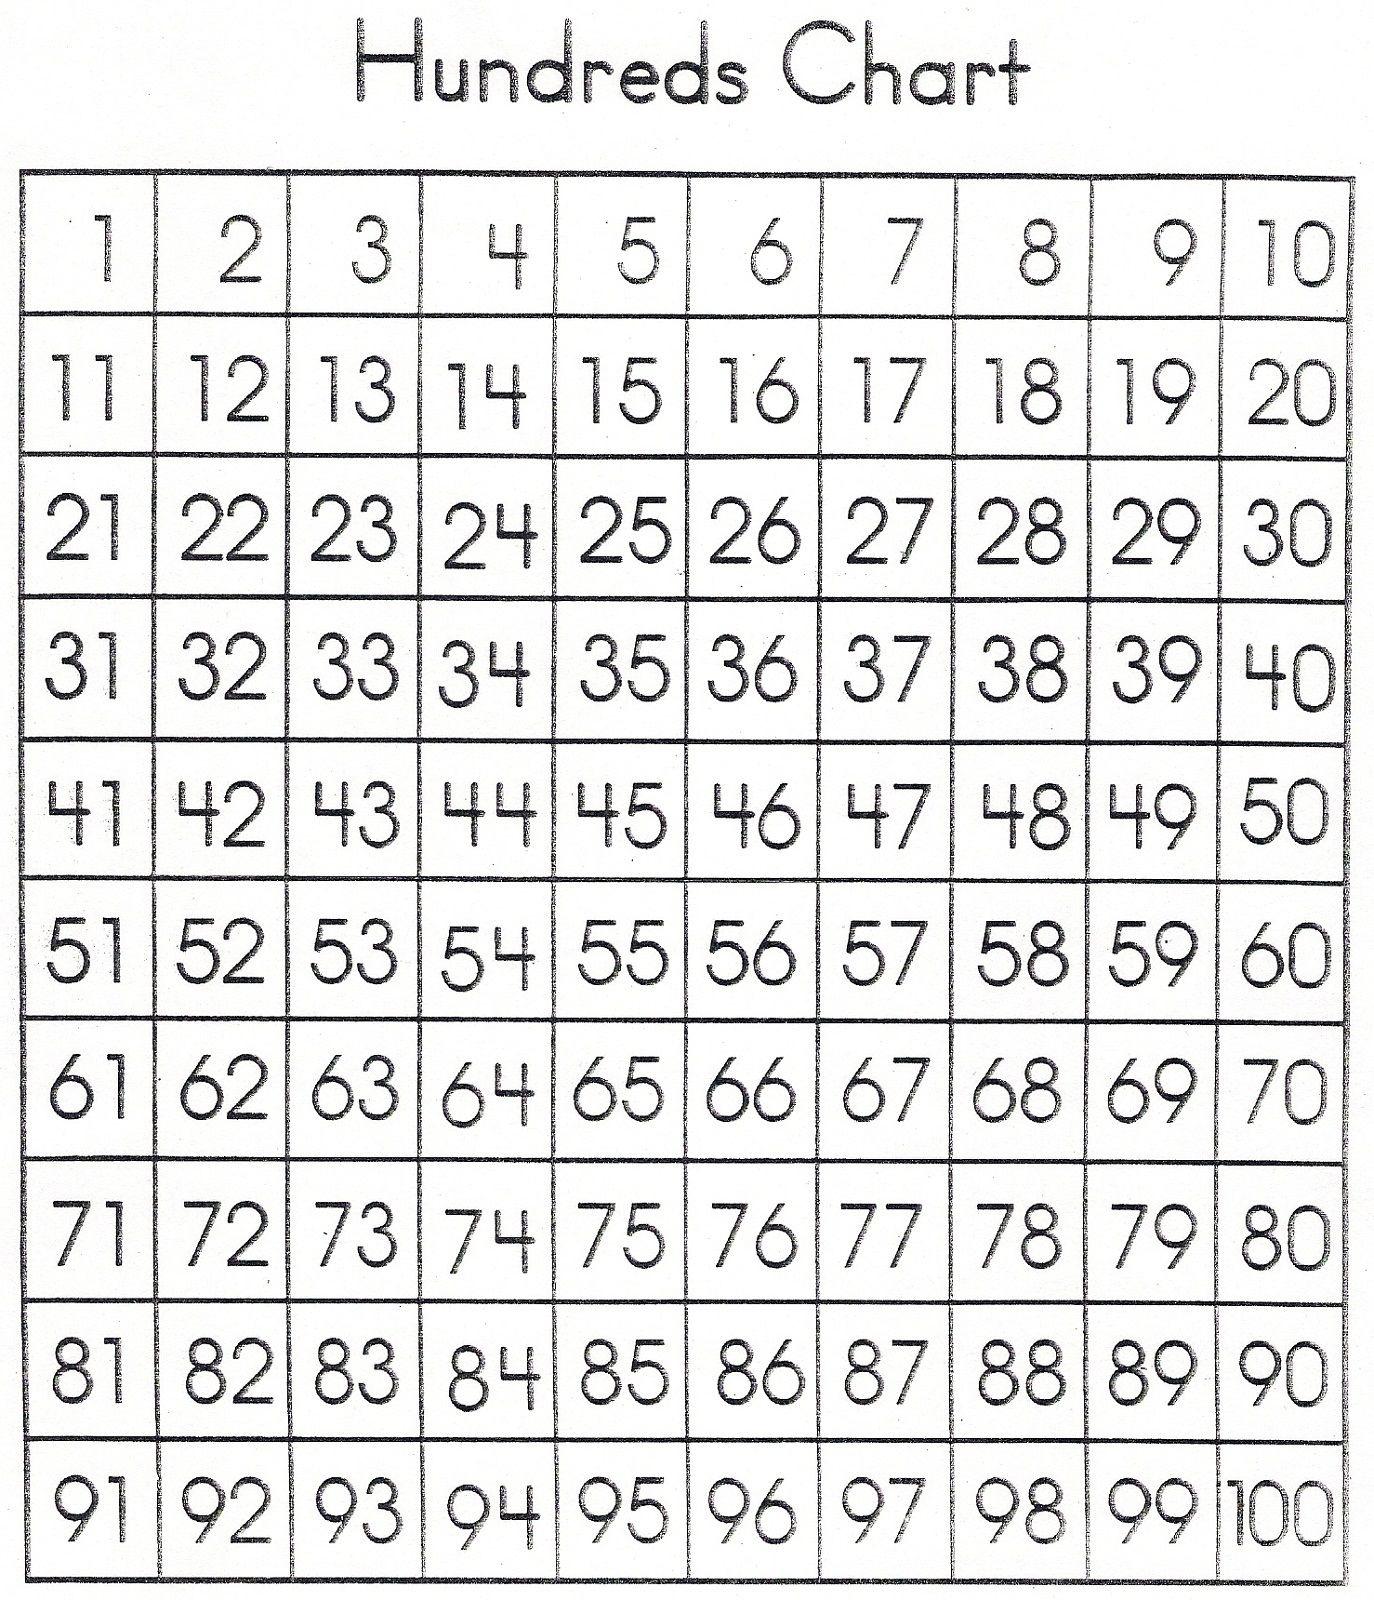 Free Printable Number Chart 1 20 | Free Printable